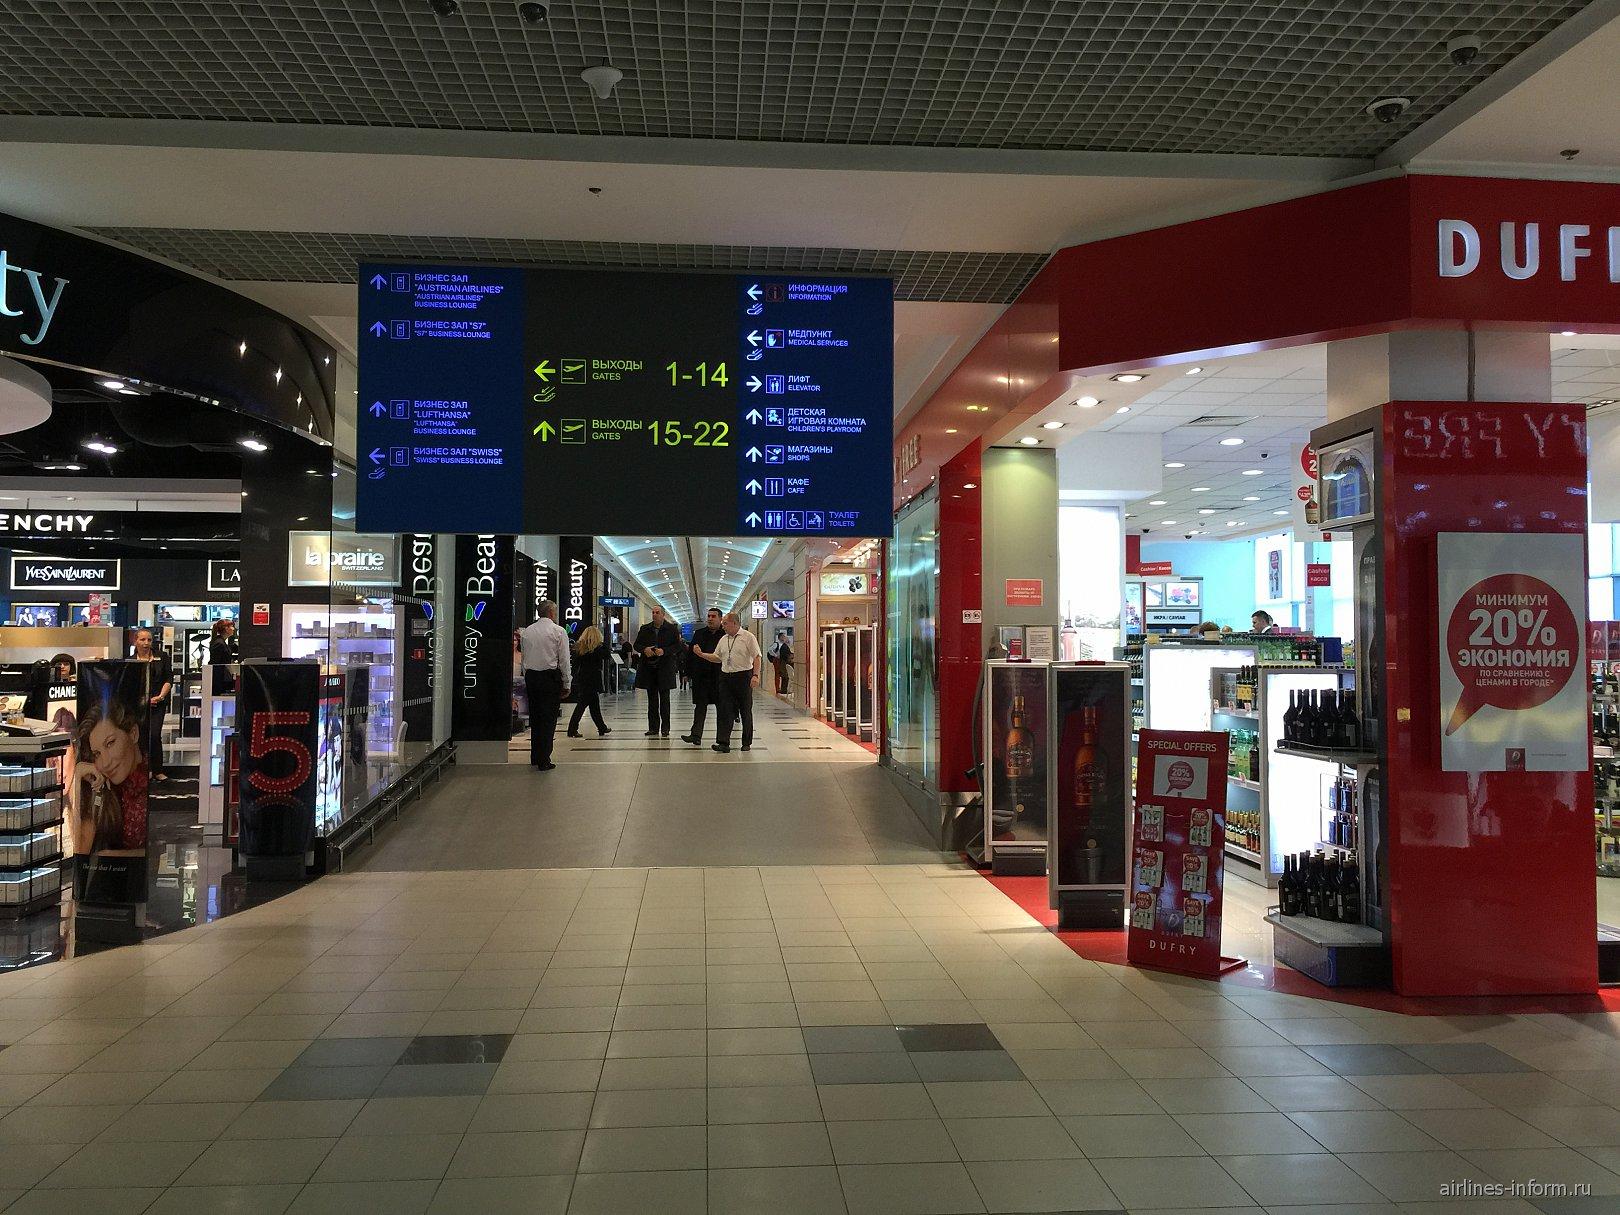 Магазины Duty-Free в аэропорту Домодедово